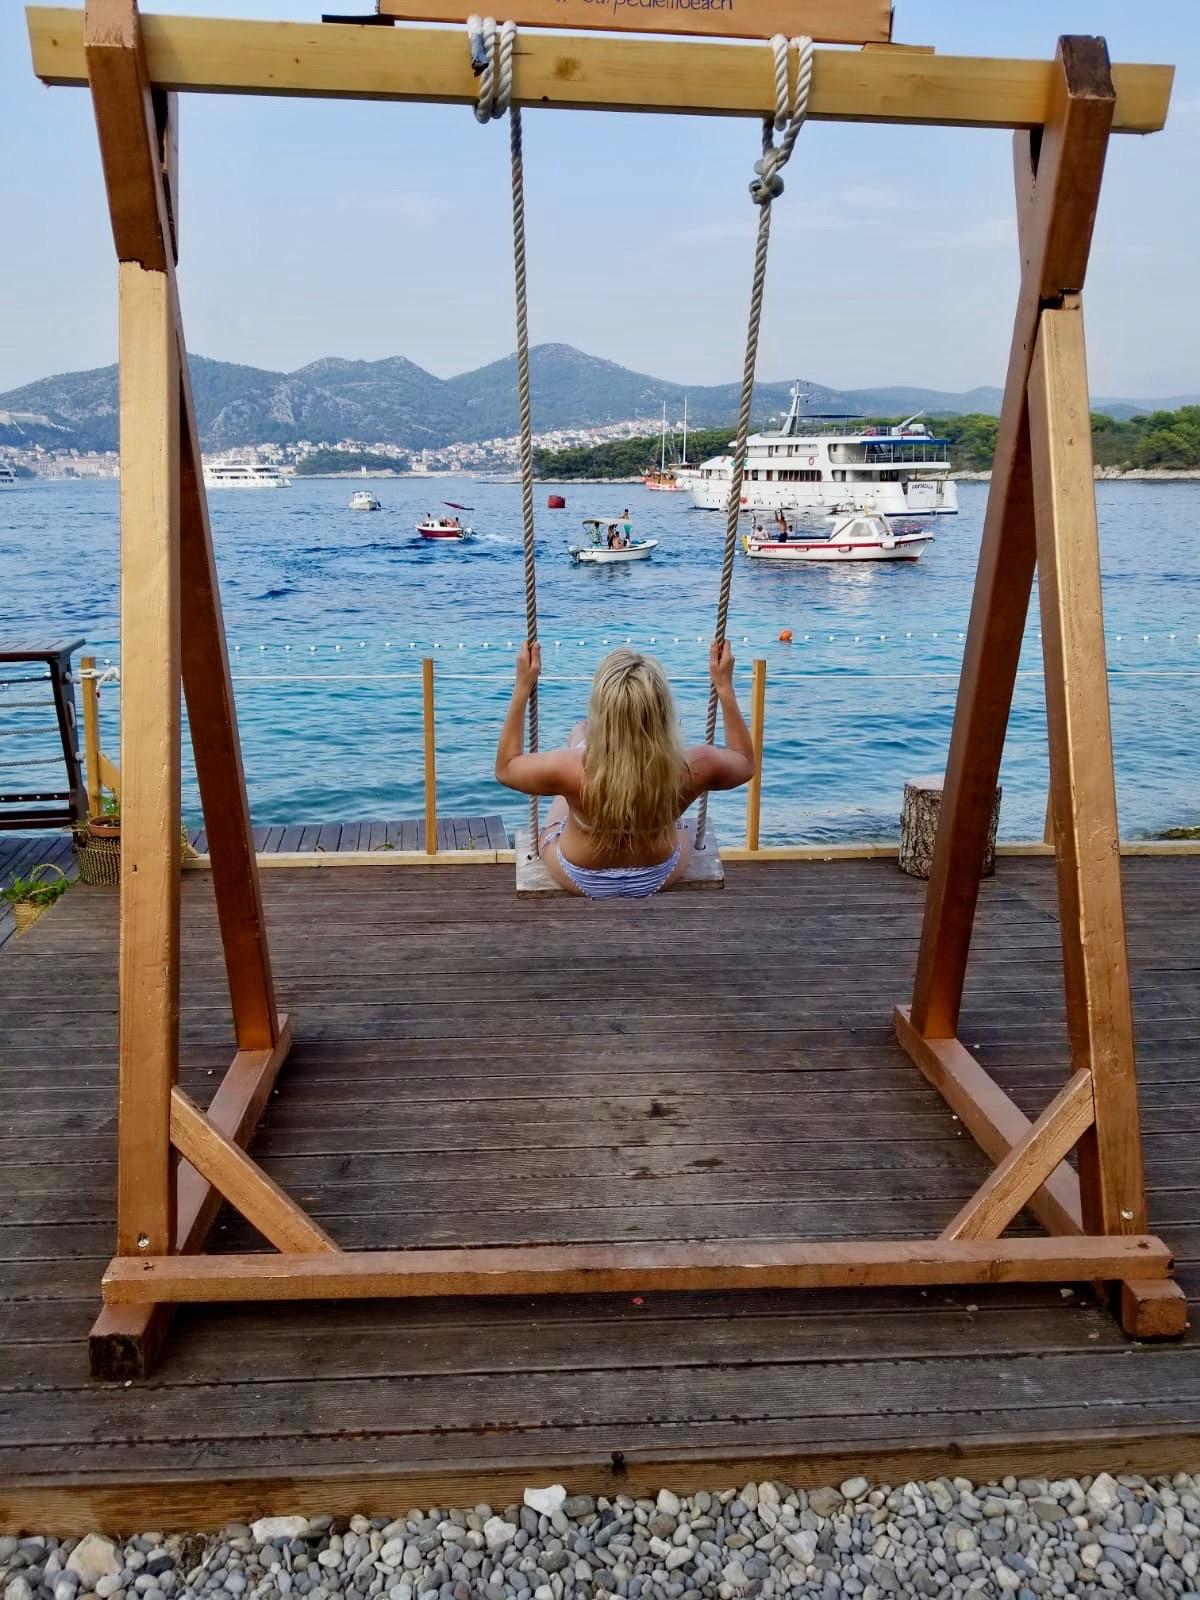 pakleni island swing croatia